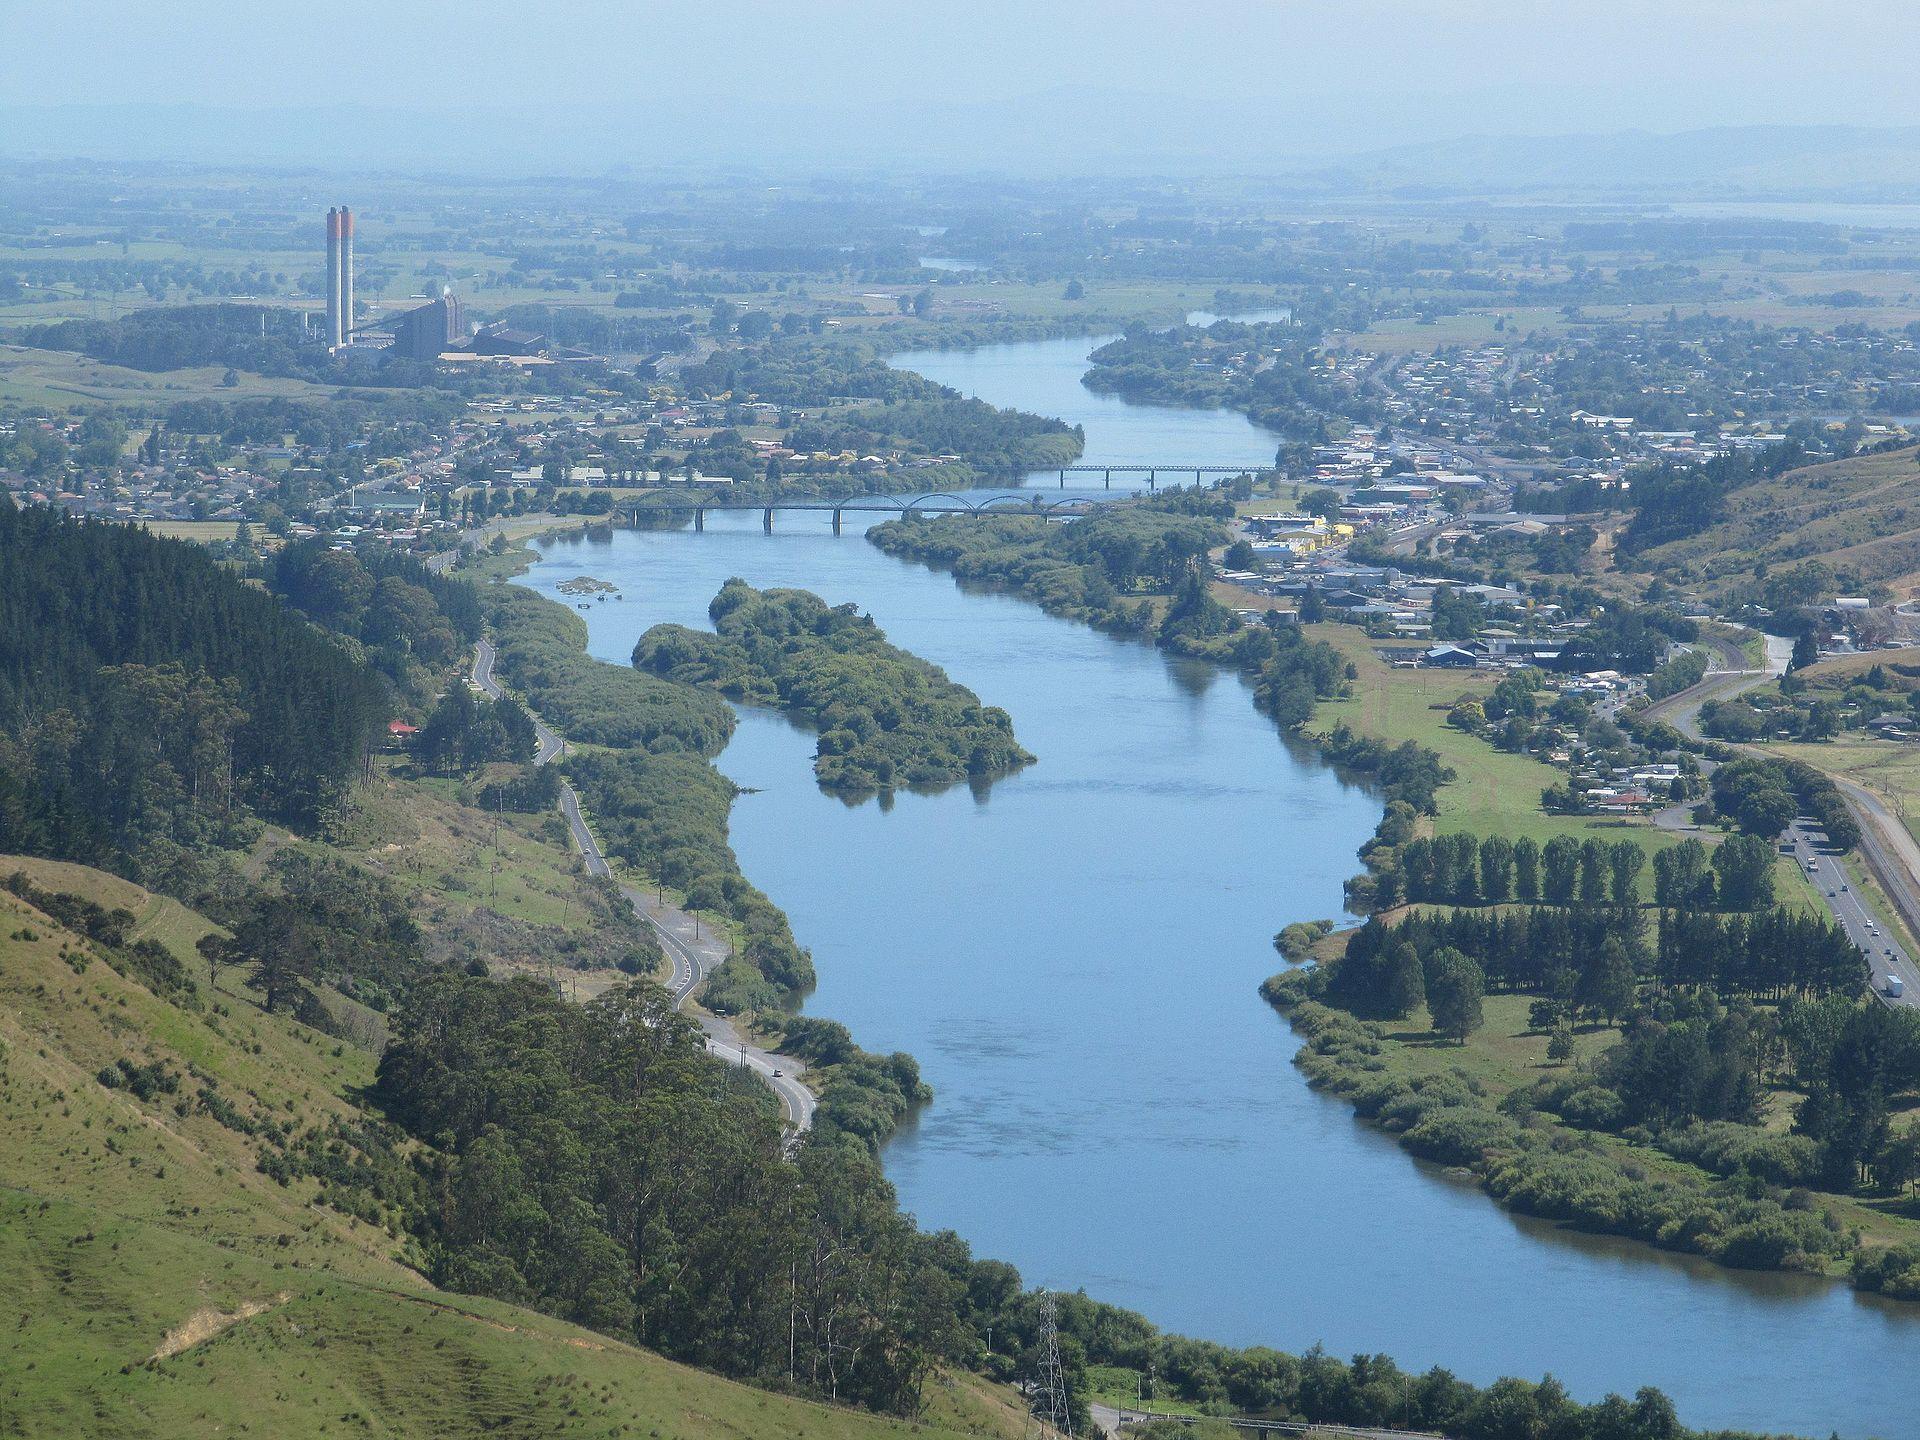 New Zealand Wikipedia: Huntly, New Zealand